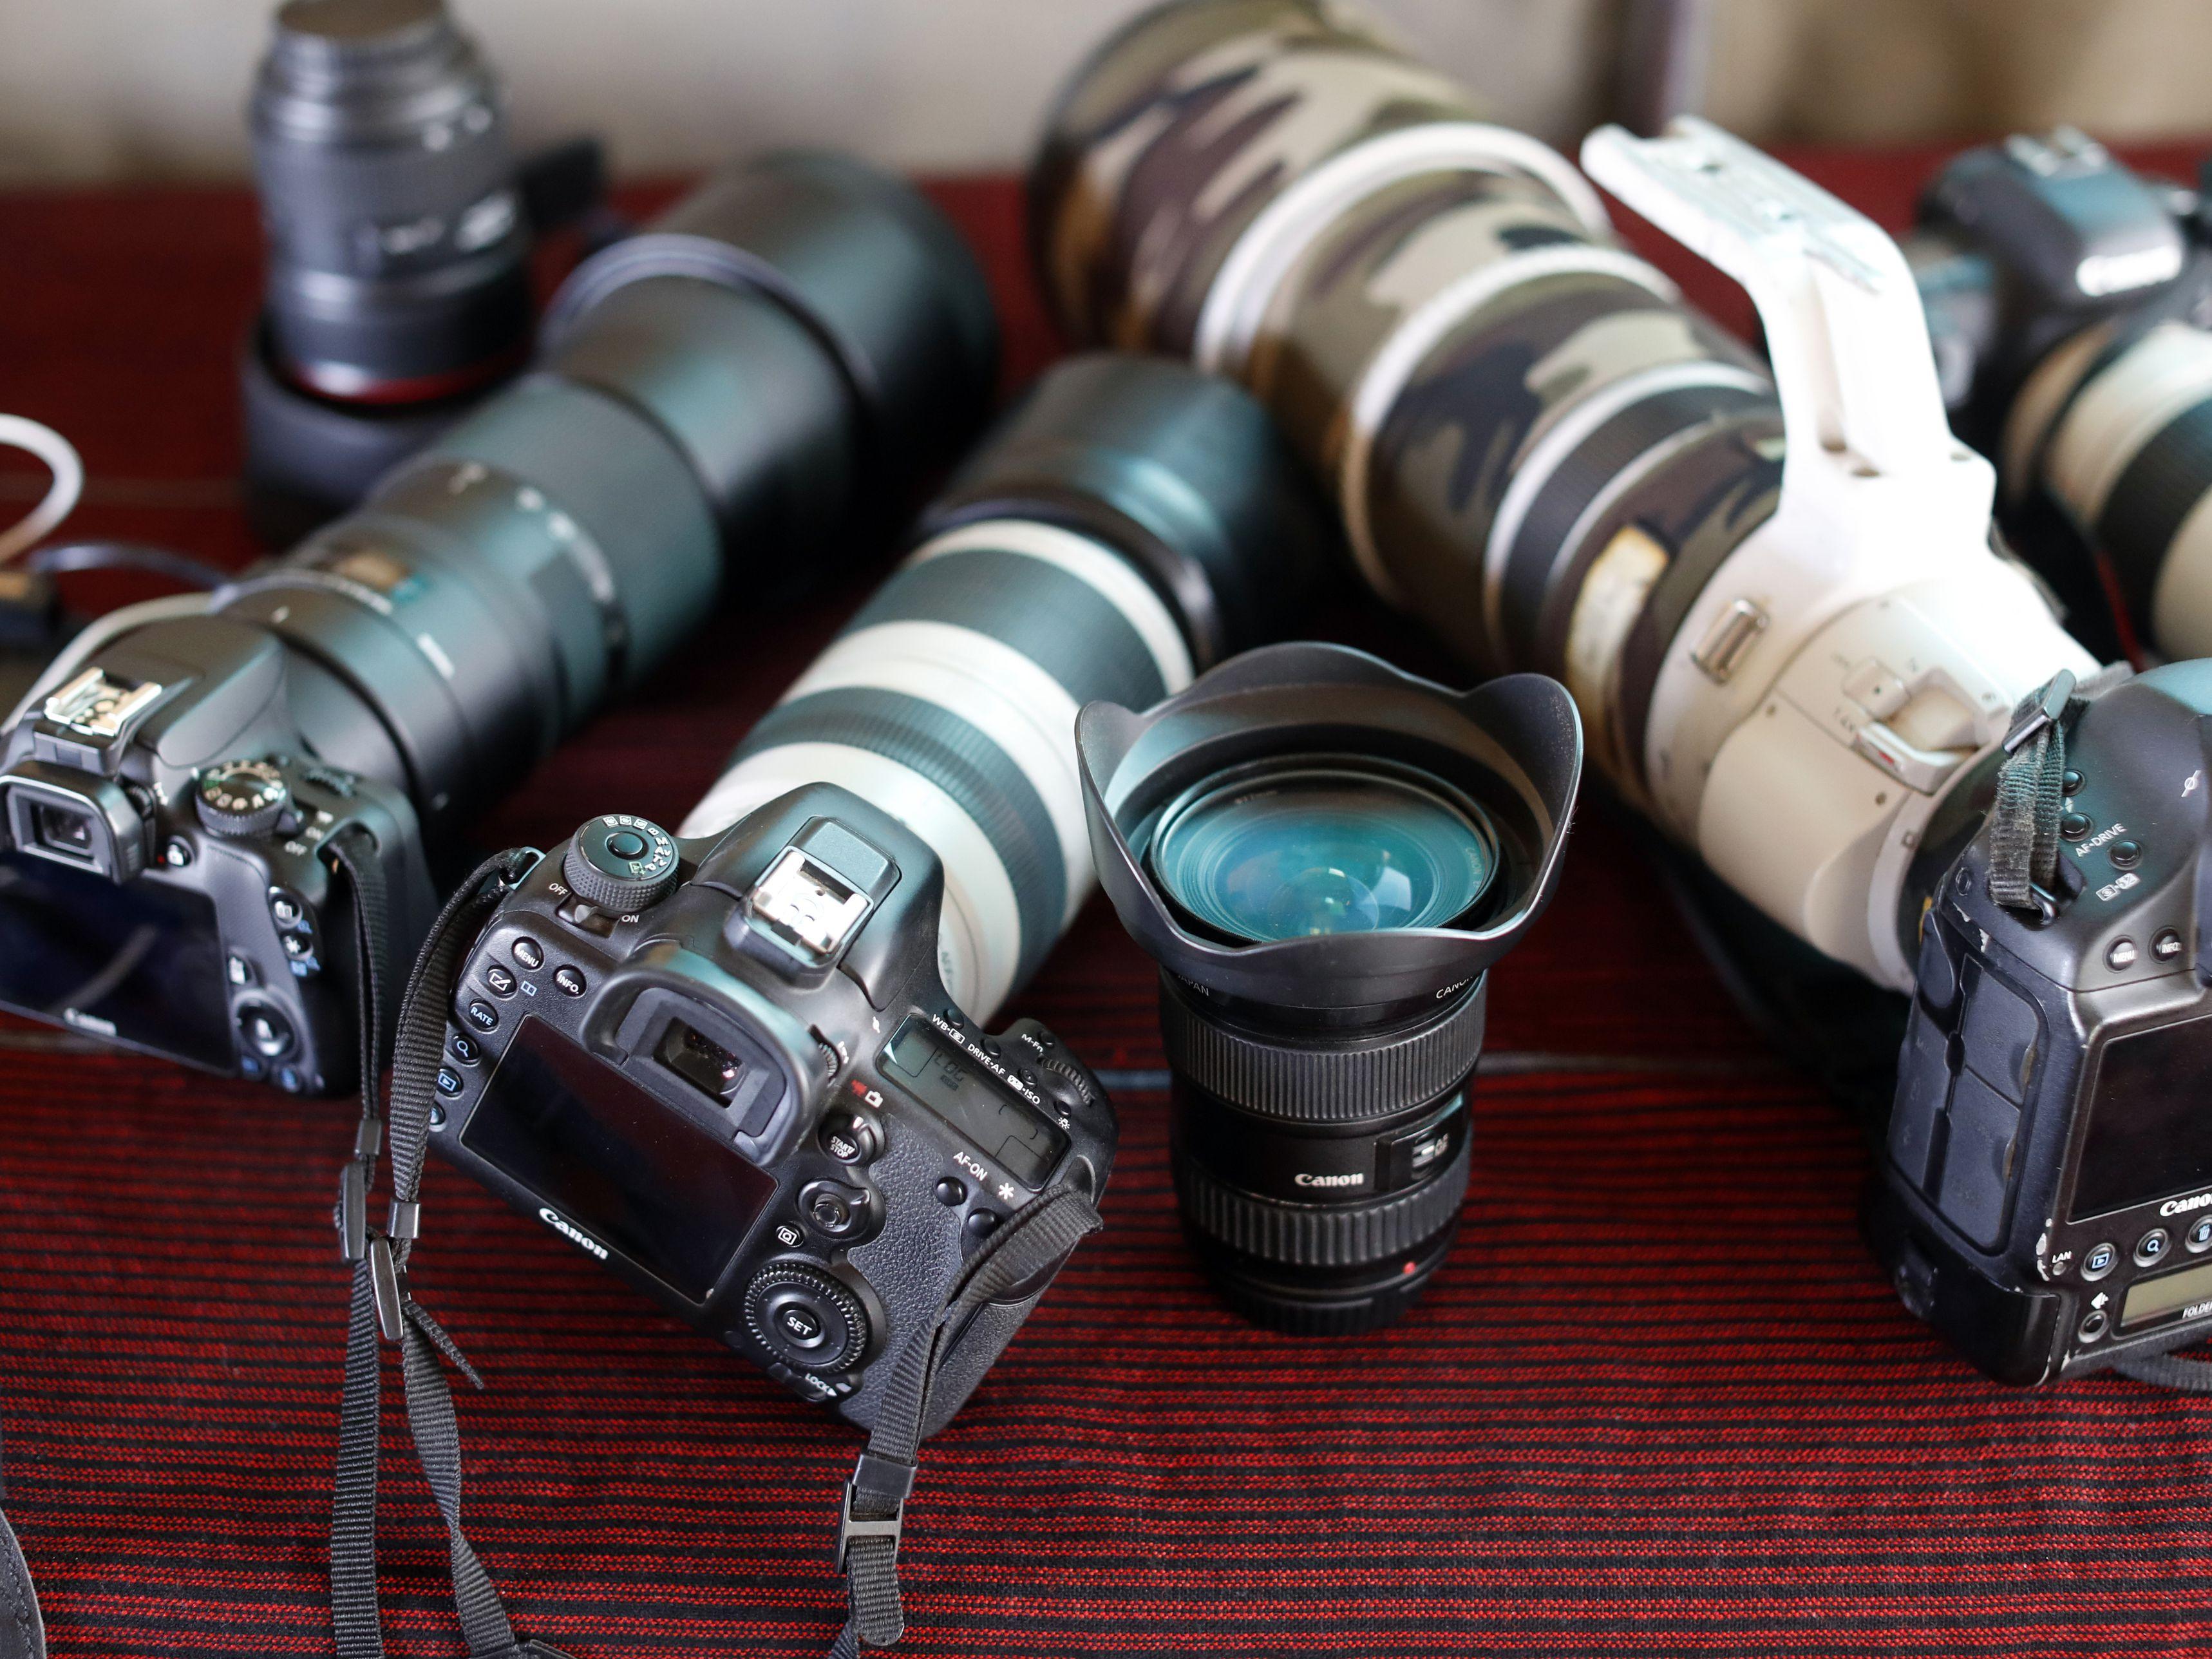 Nikon Troubleshooting: Tips for Fixing Nikon Cameras